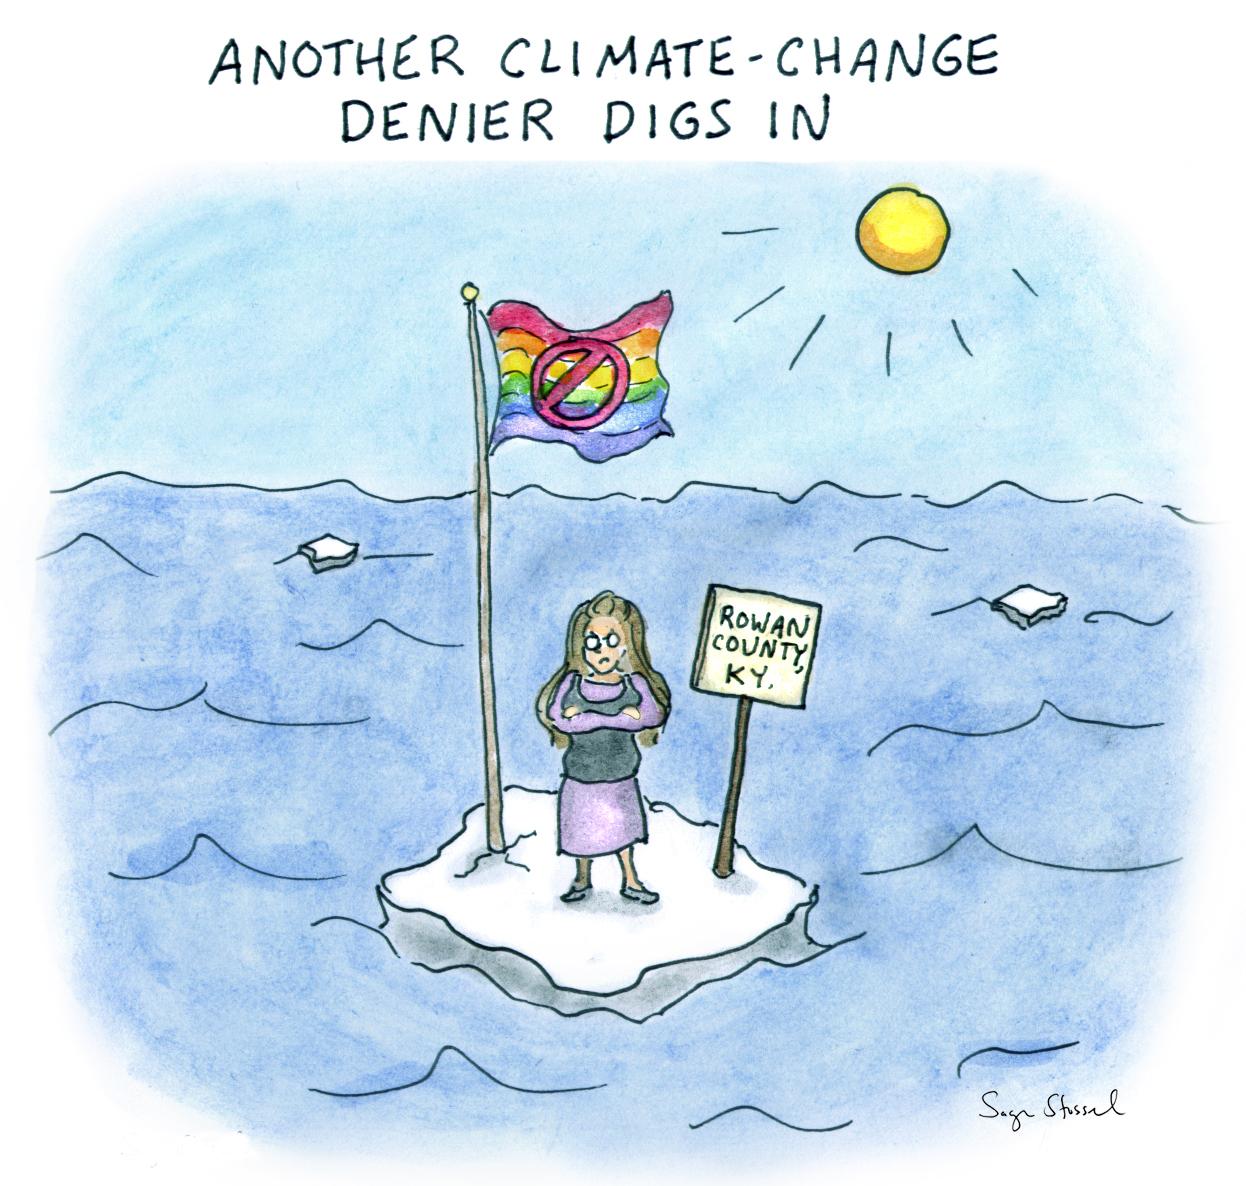 climate change, rowan county, kentucky clerk, kim davis, gay marriage licenses, cartoon